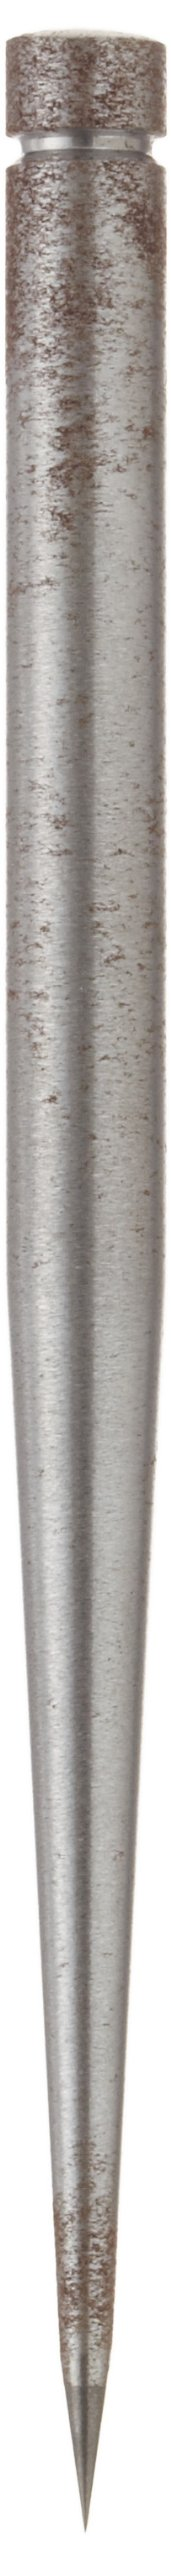 Starrett PT19306 Carbide Point For Pocket Scriber No. 70BX